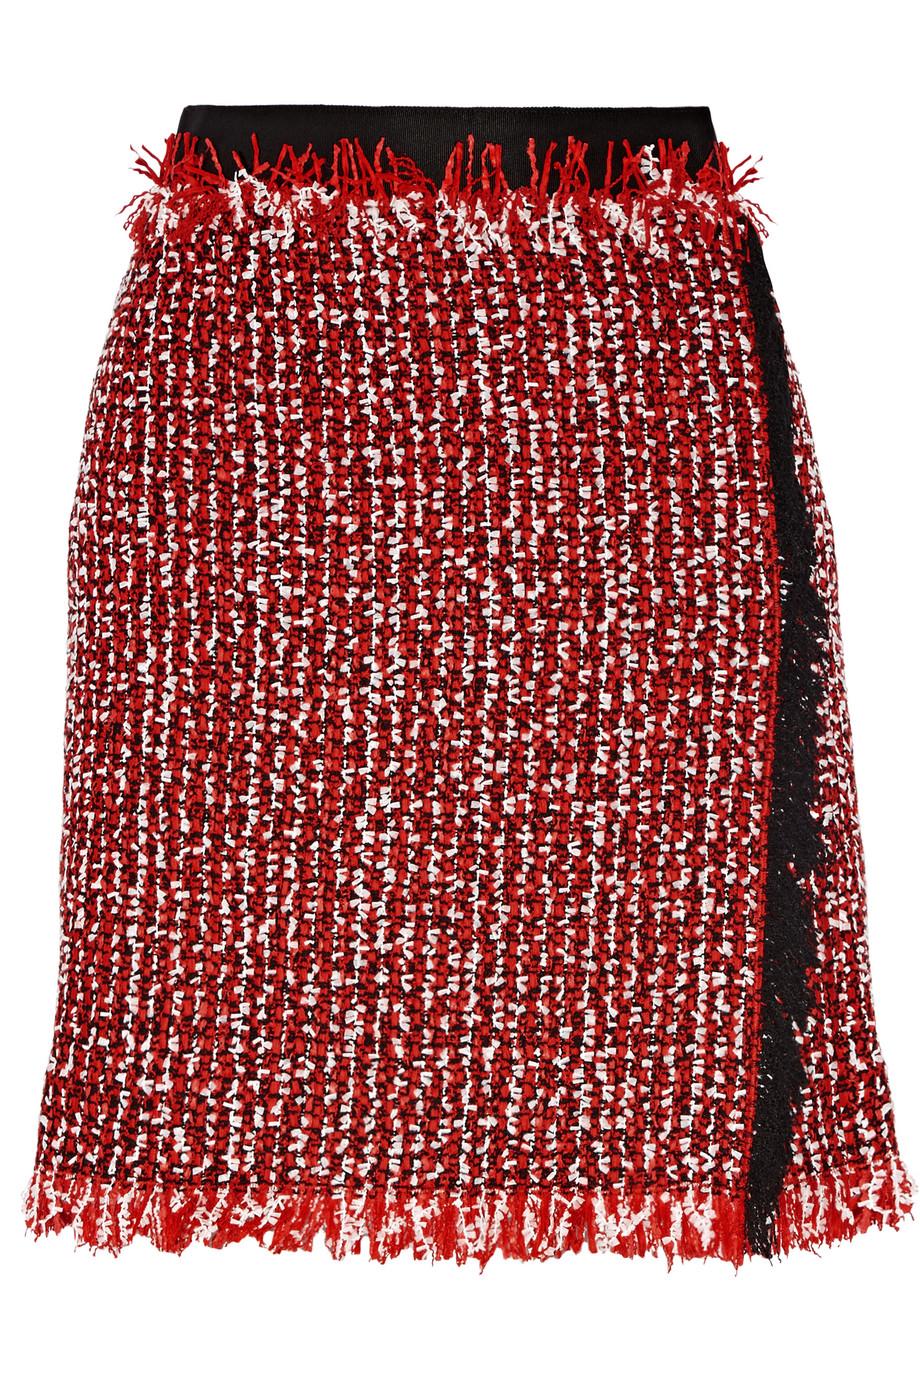 Lanvin Wrap-Effect Cotton-Blend Tweed Mini Skirt, Red, Women's, Size: 36